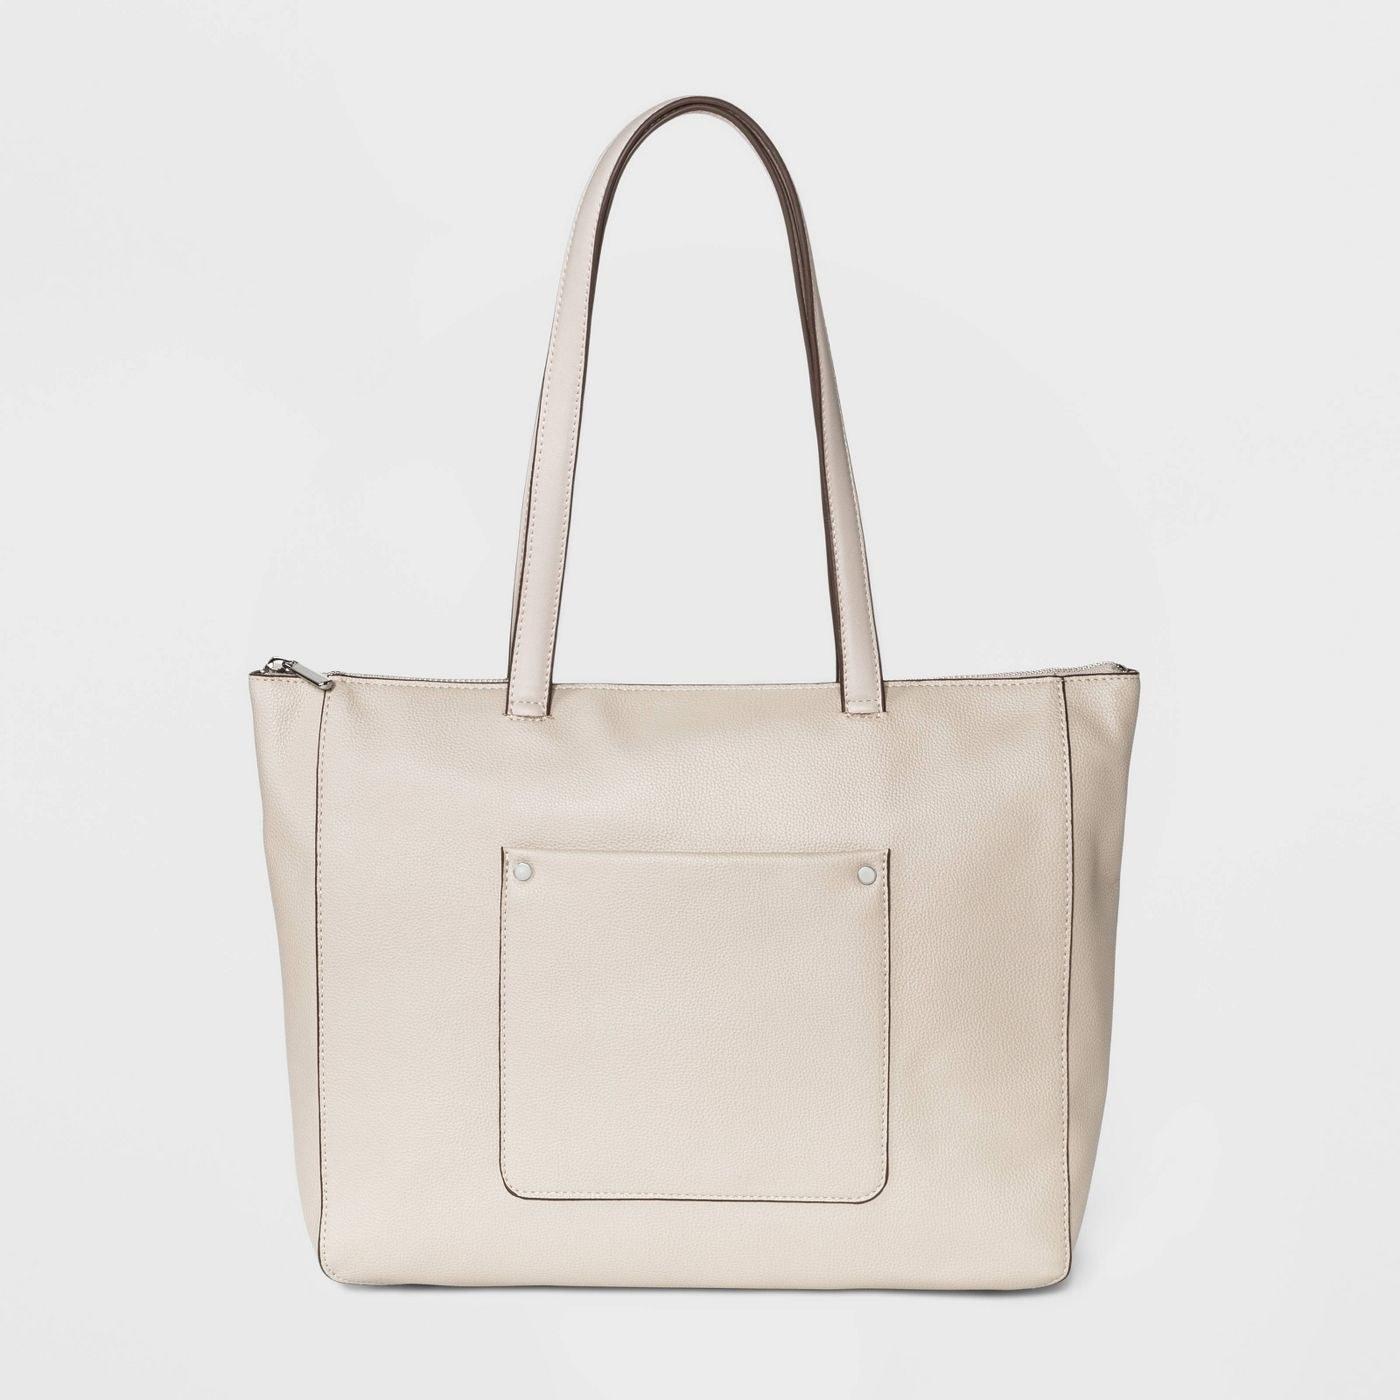 The beige bag